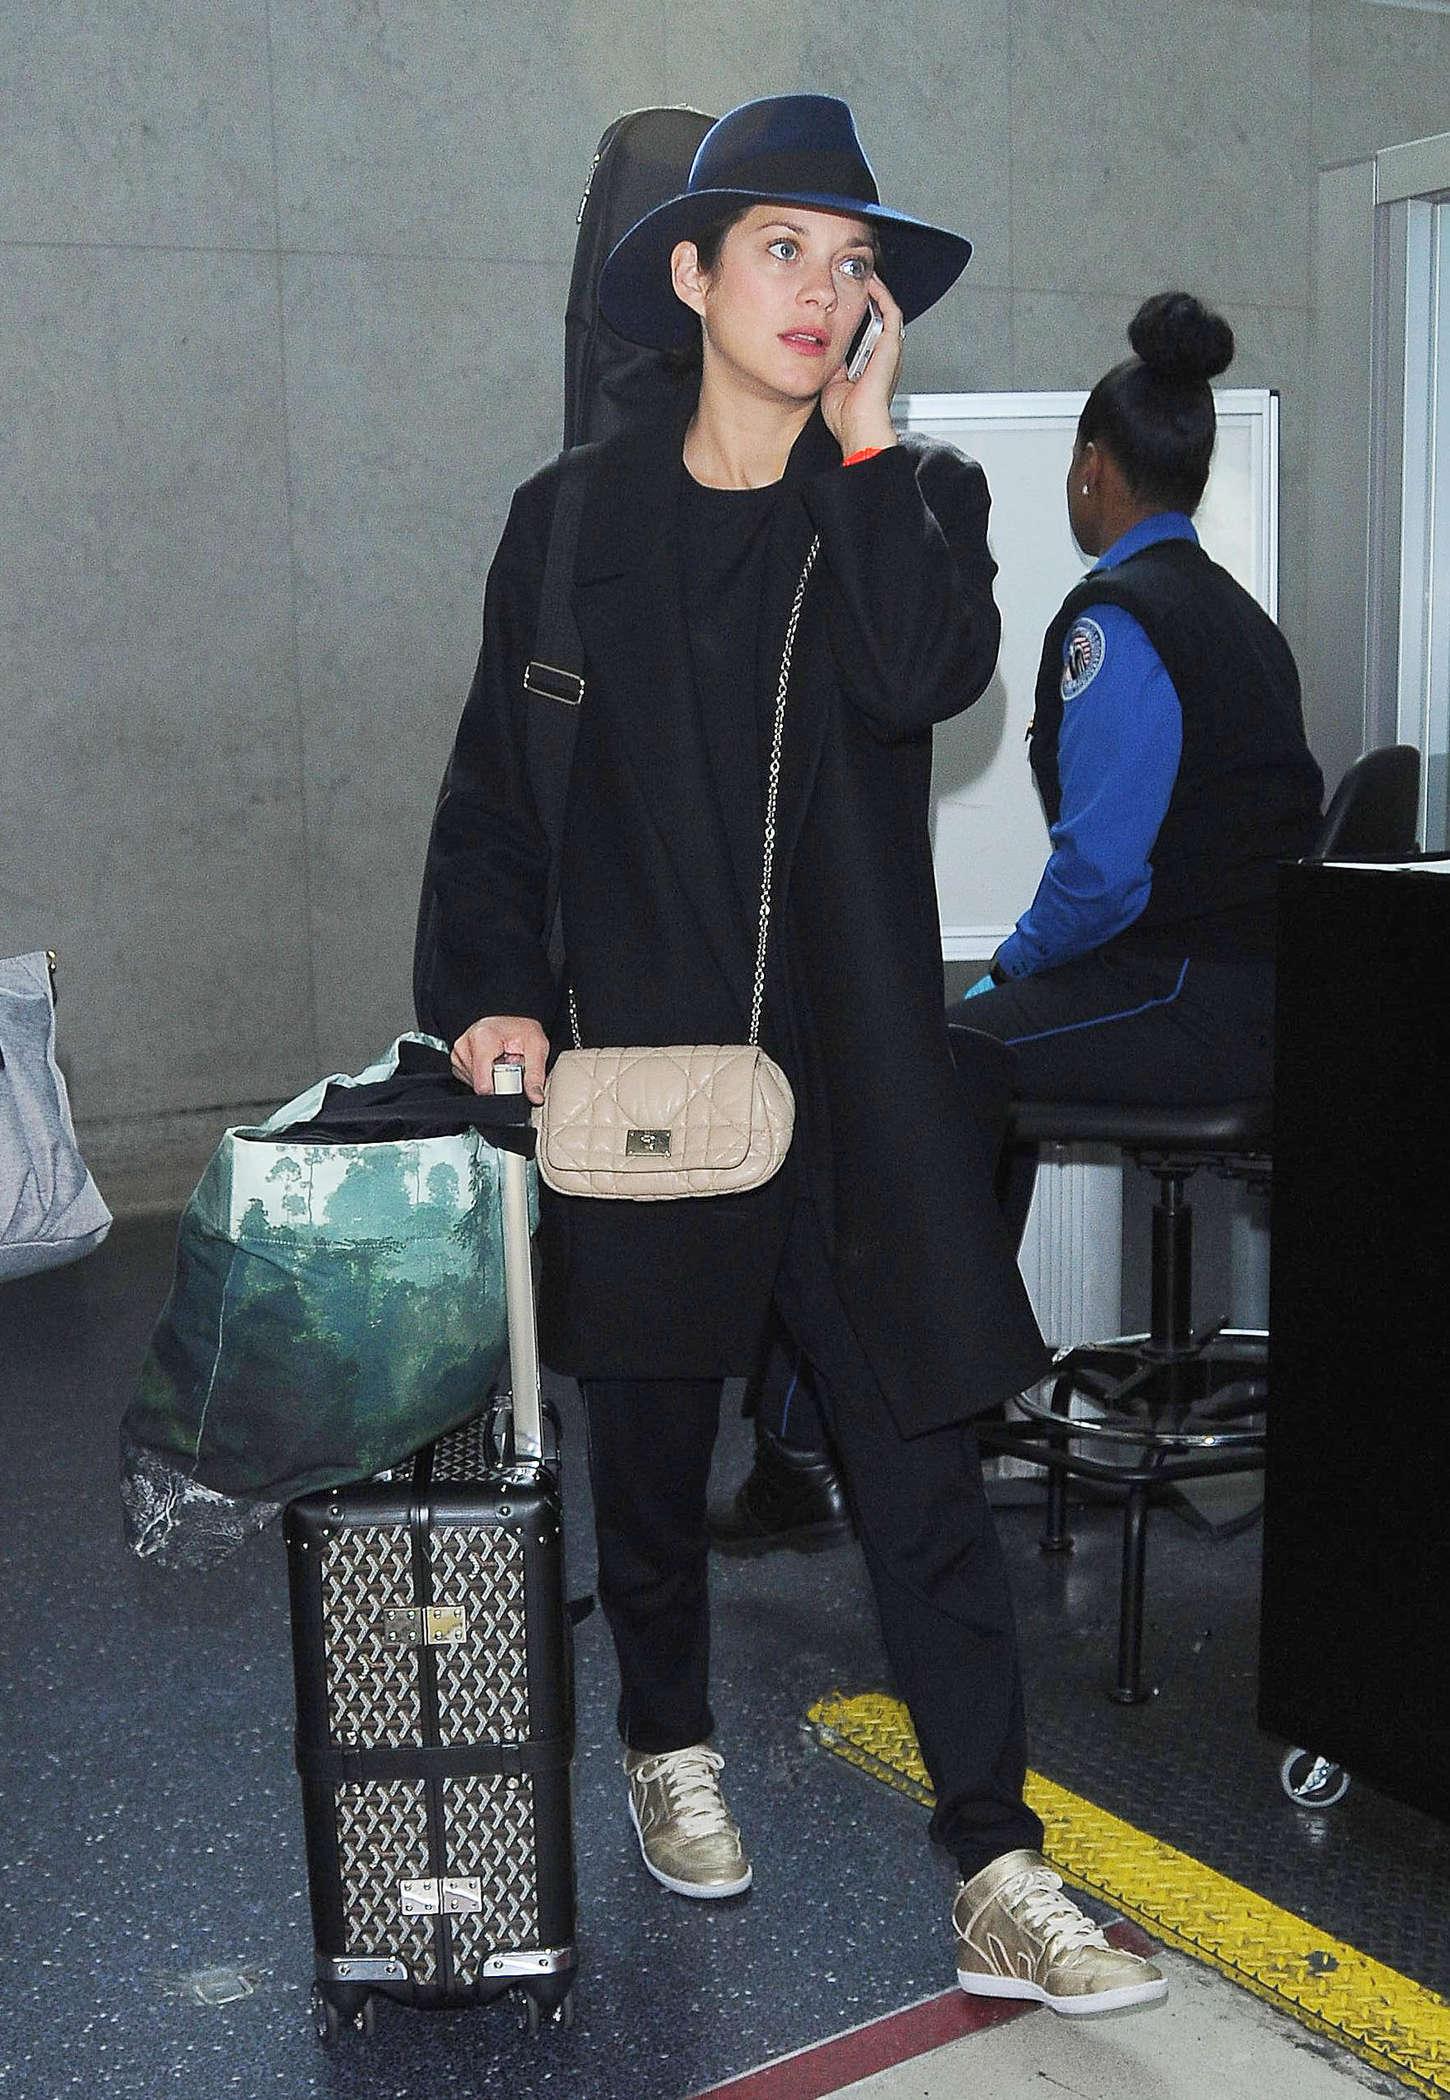 Marion Cotillard 2014 : Marion Cotillard at LAX -11